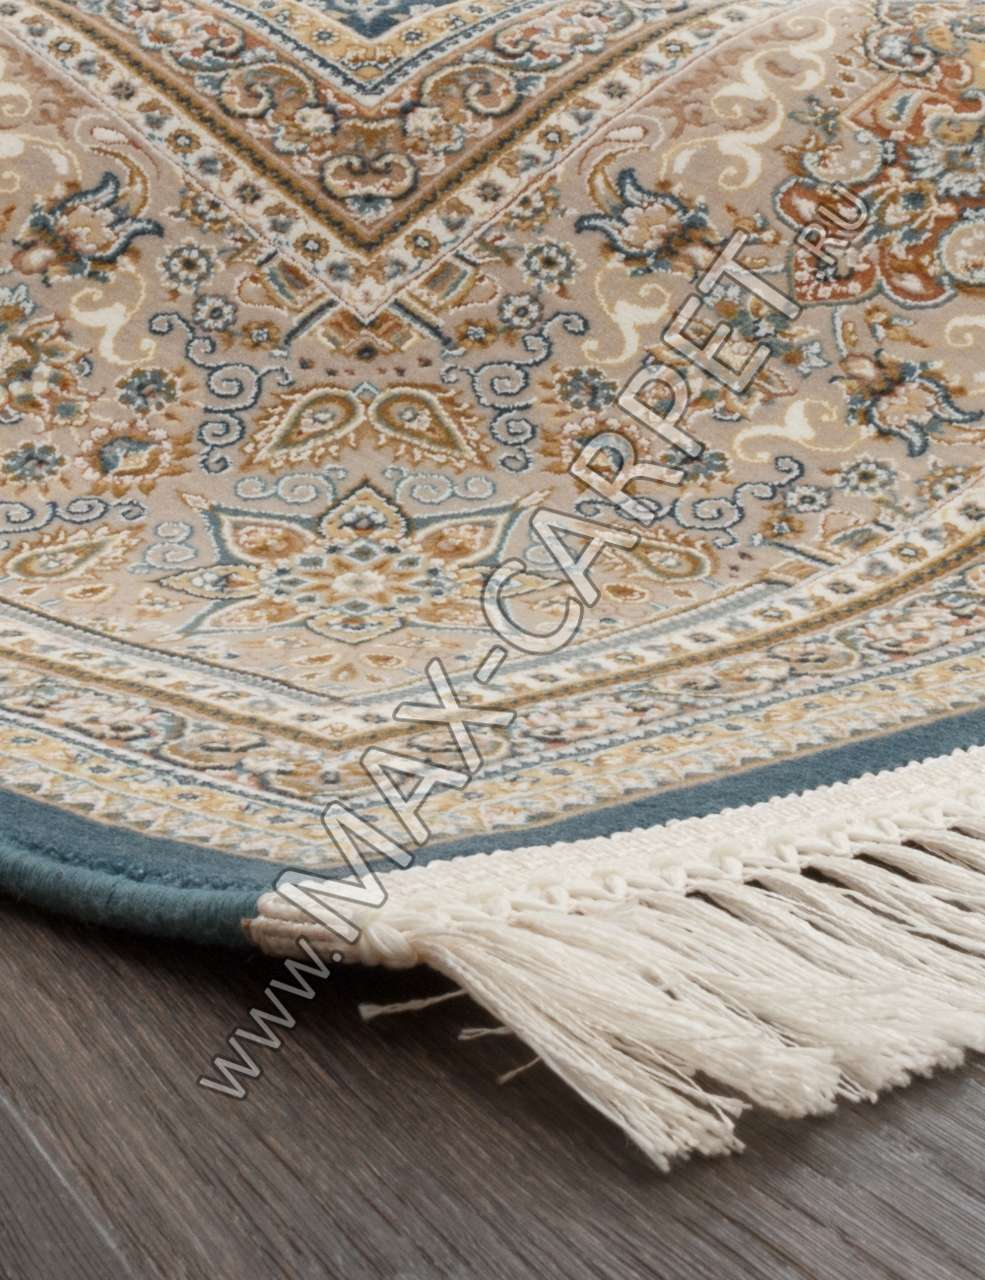 Иранский ковер из бамбука FARSI 1200 G121 — BLUE